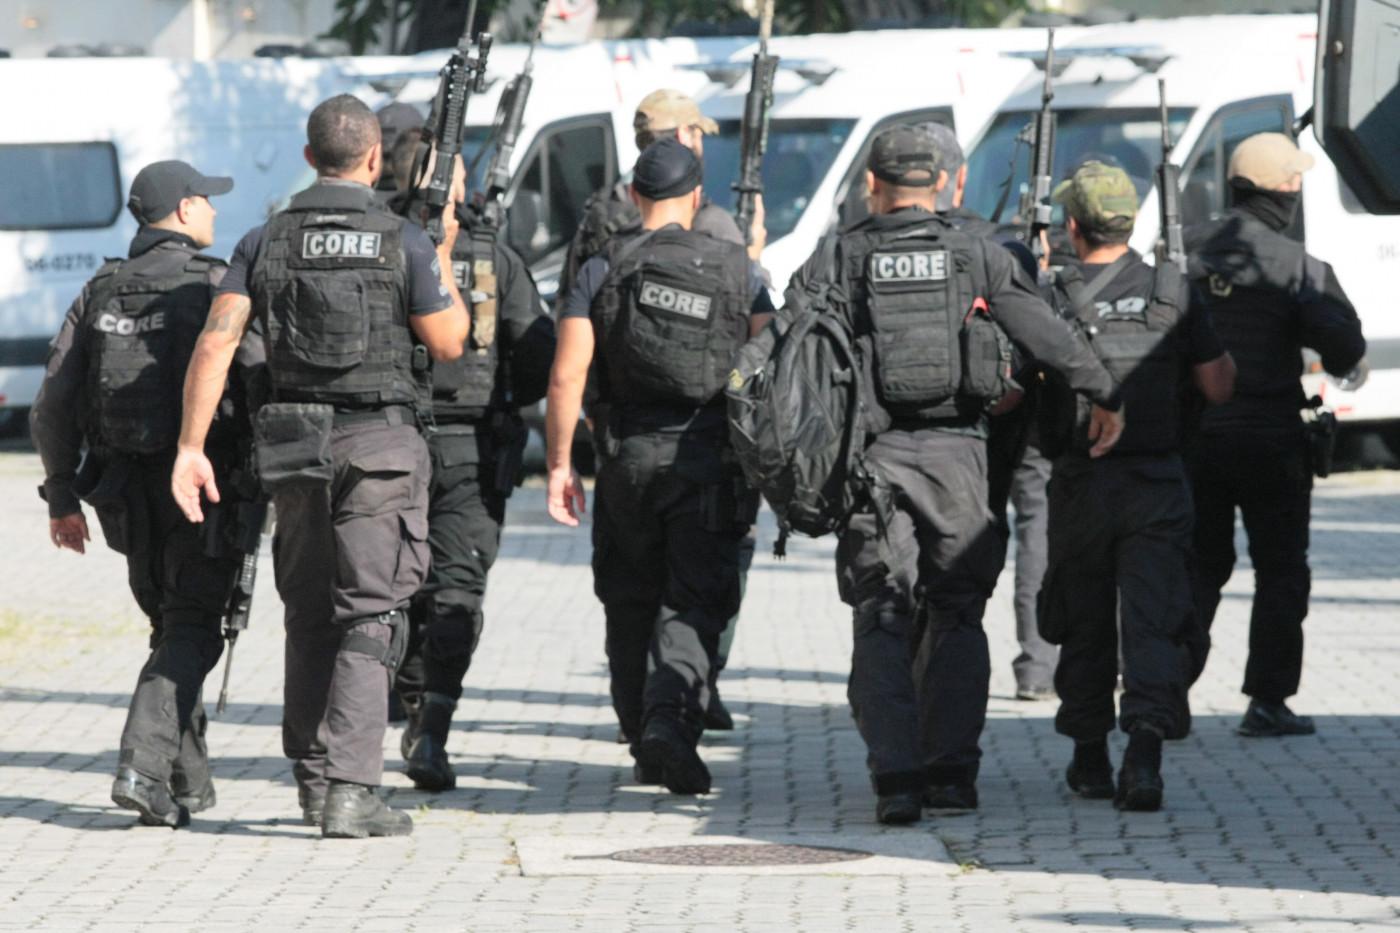 Vários policiais andando uns ao lado dos outros usando fardas e coletes pretos e empunhando armas